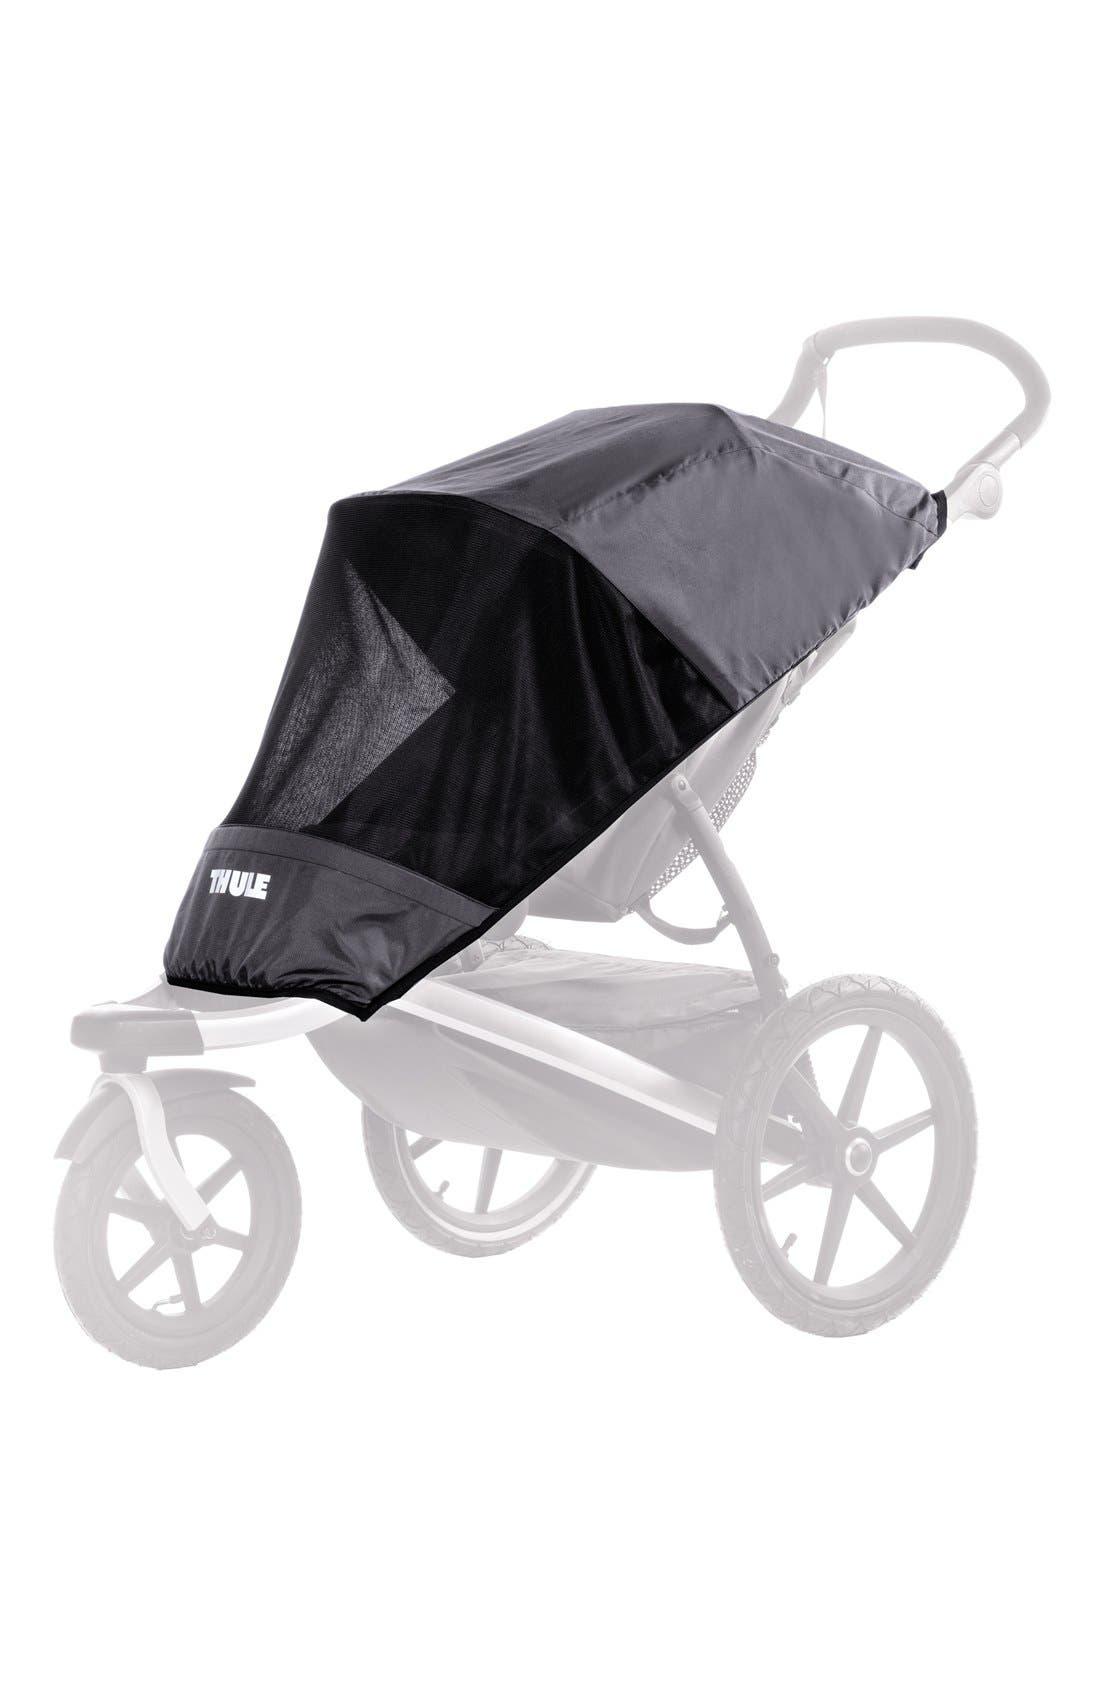 Thule Glide Series Mesh Stroller Cover